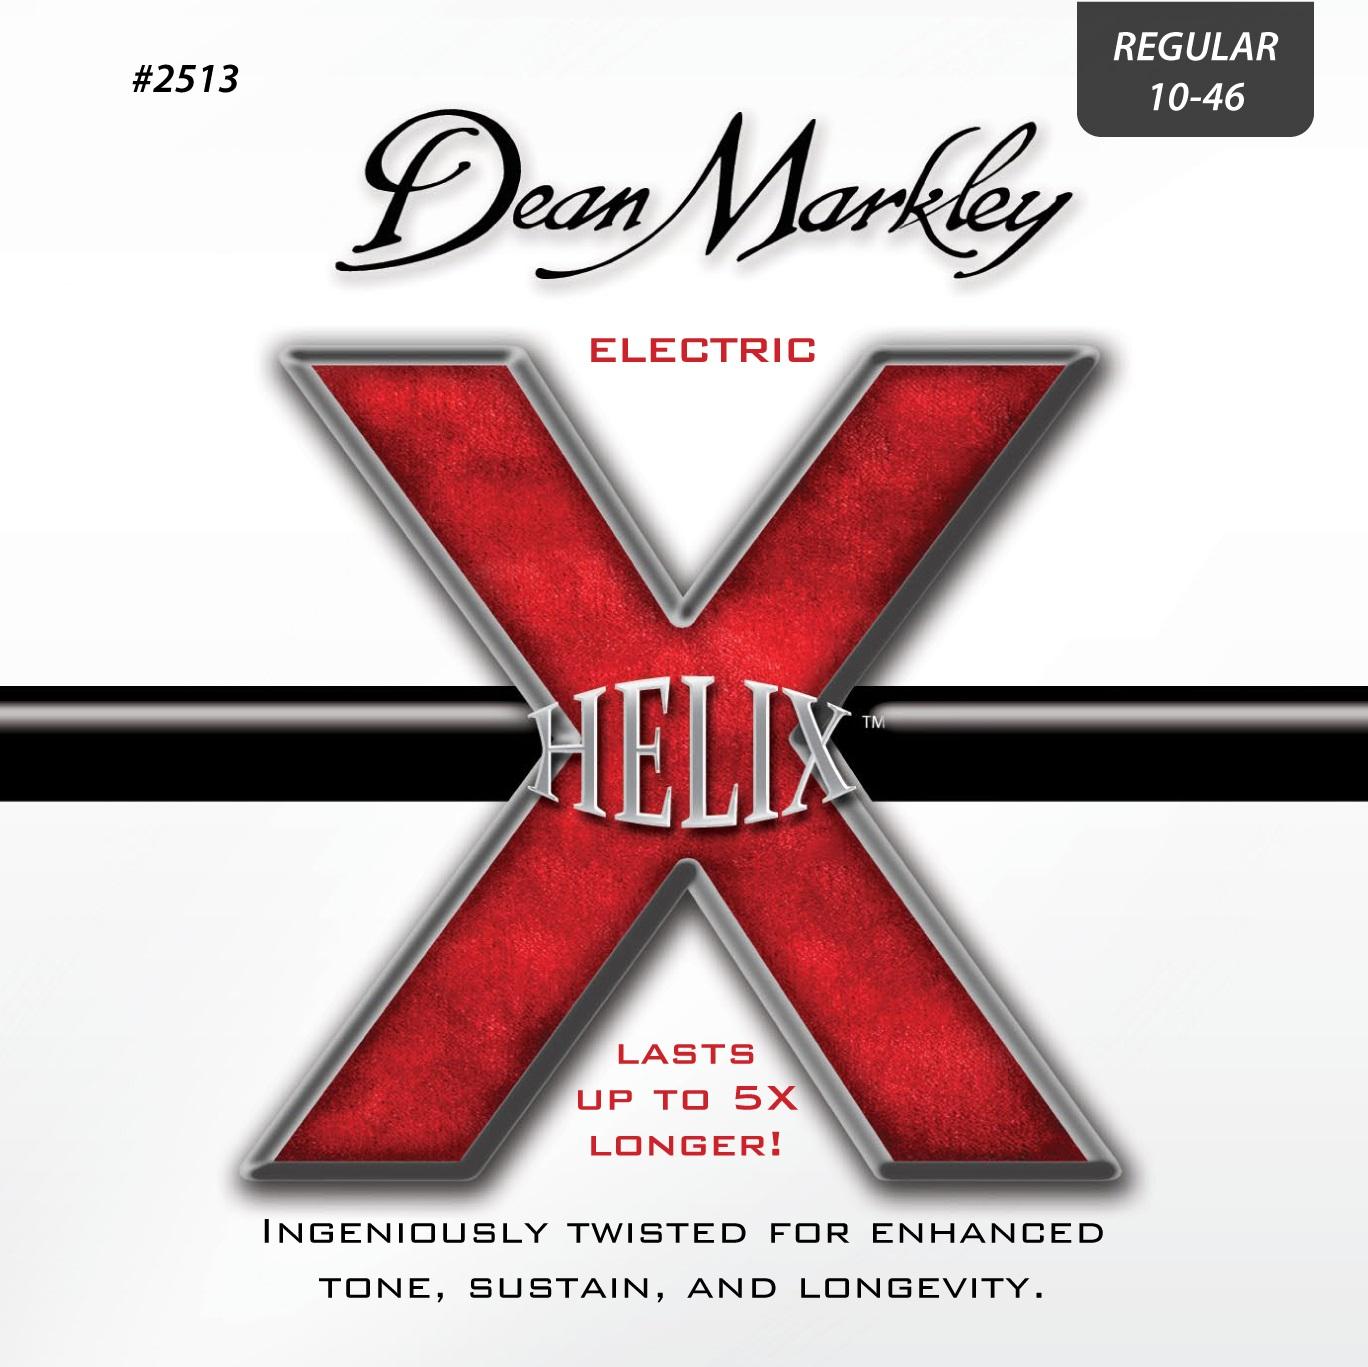 Dean Markley 2513 REG 10-46 Helix Electric 010-013-017-026-036-046 REGULAR